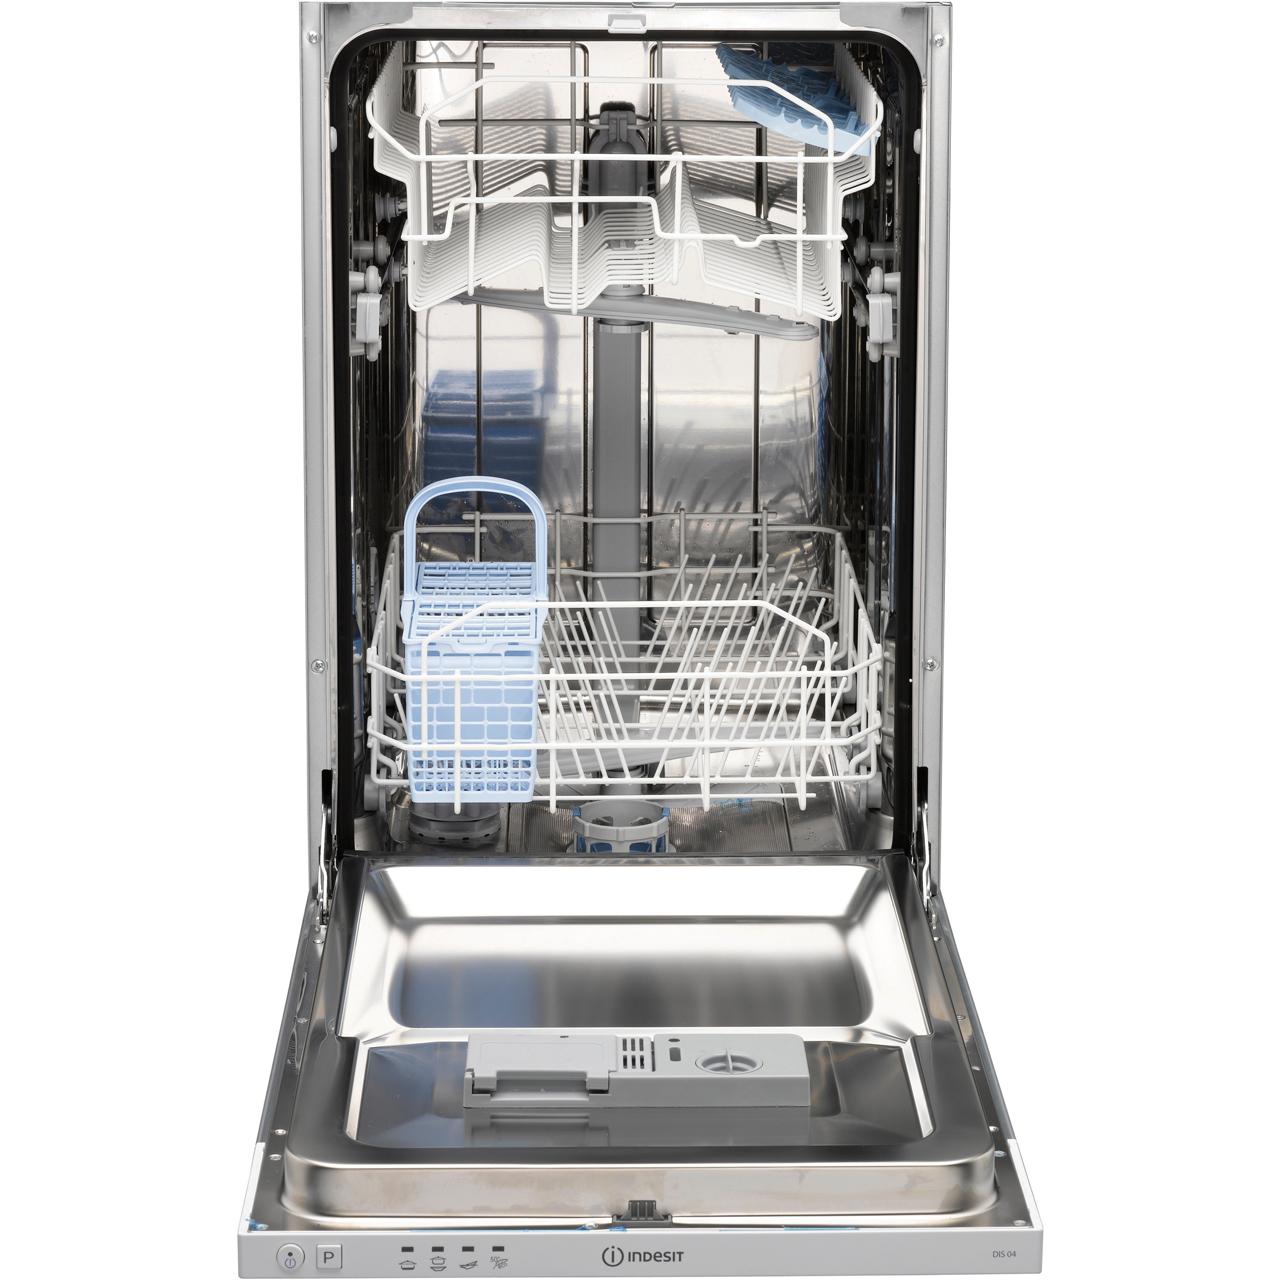 Small Dish Washer Disr14b1 Wh Indesit Slimline Dishwasher Aocom